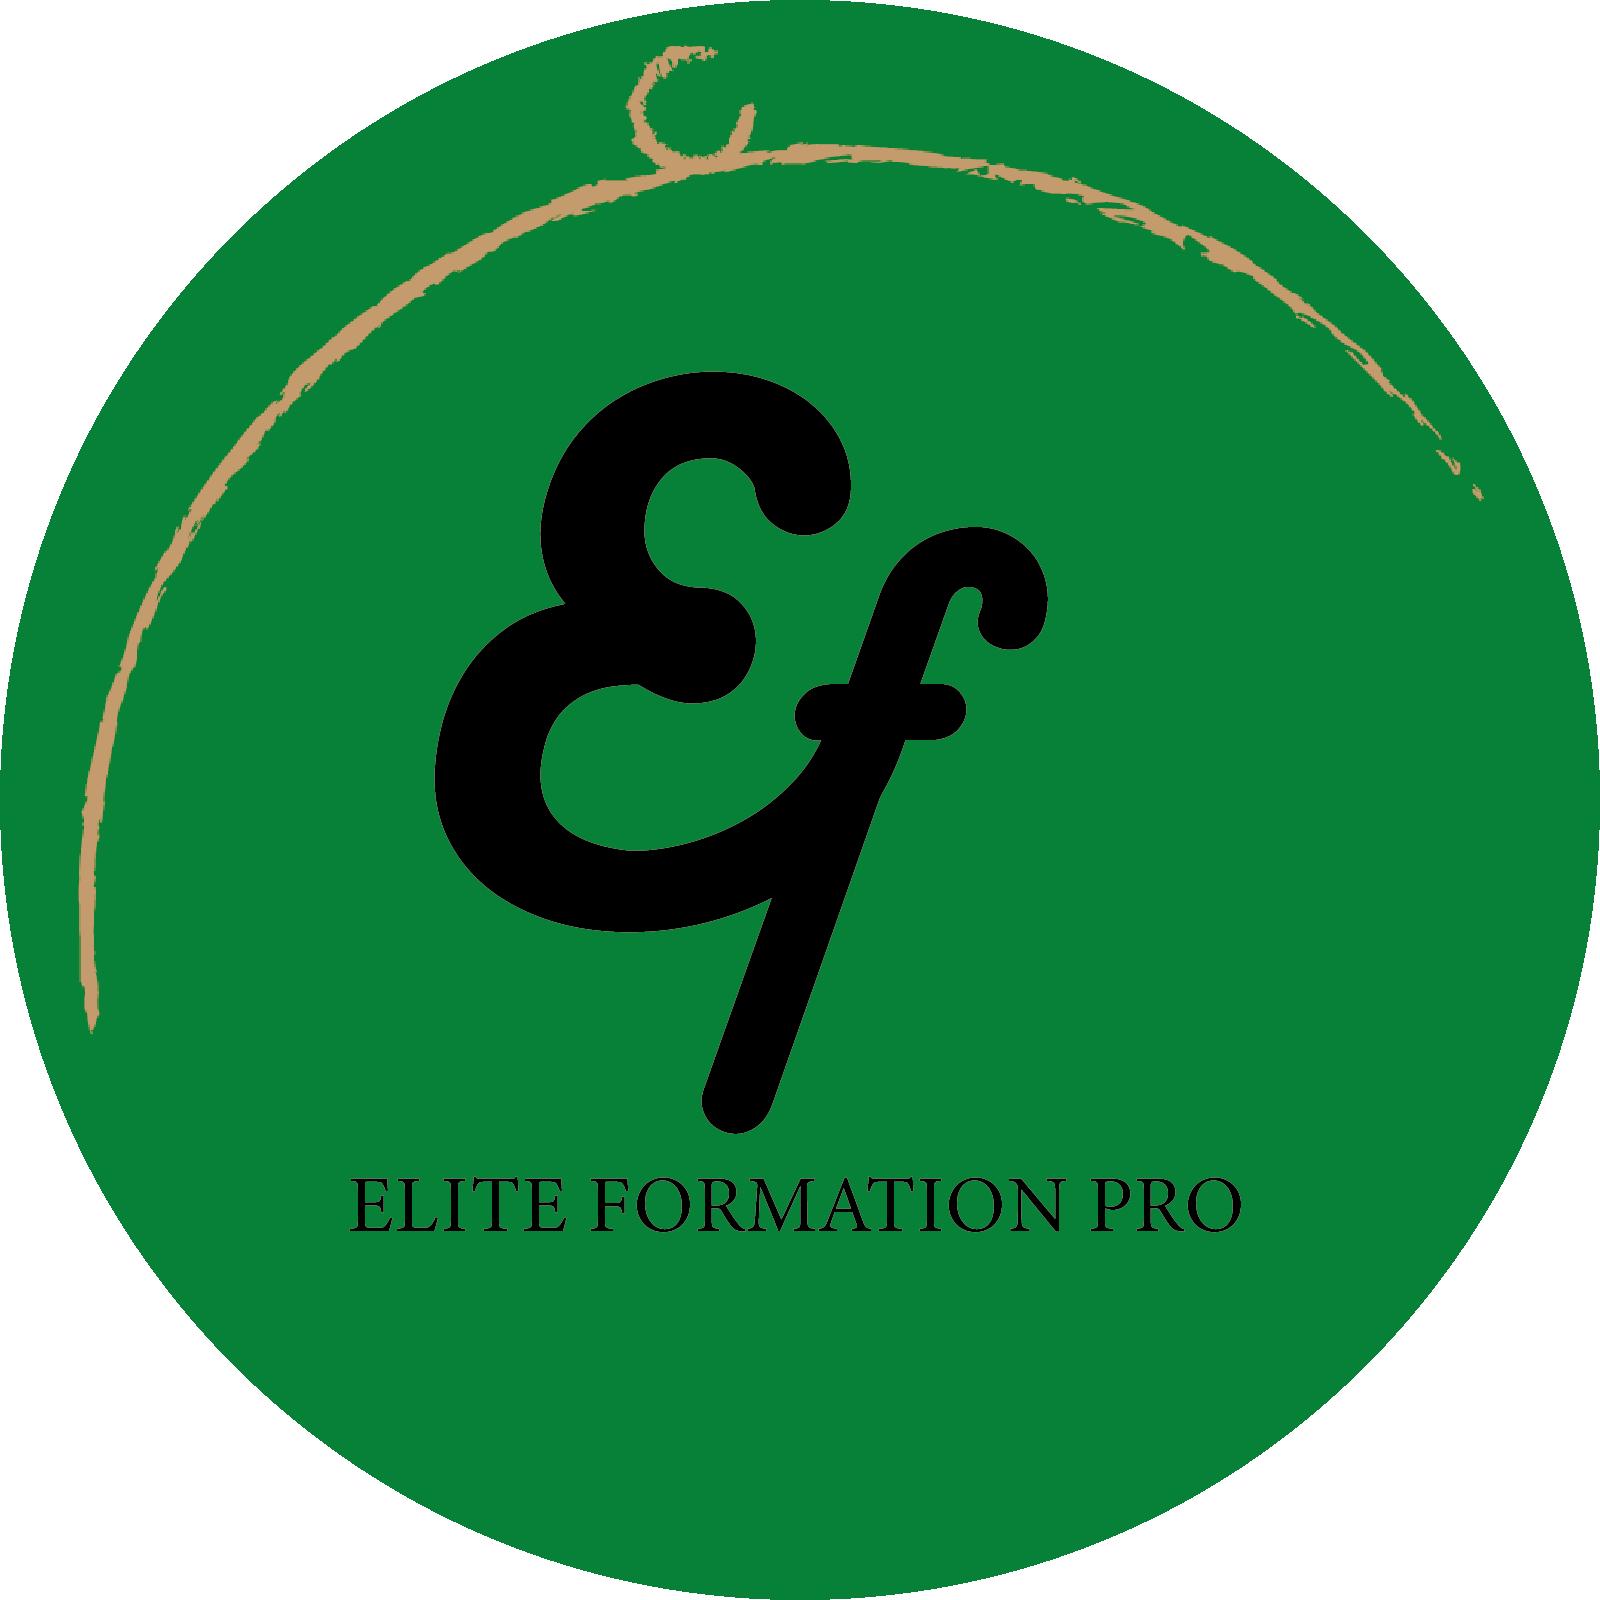 ELITE FORMATION ROND